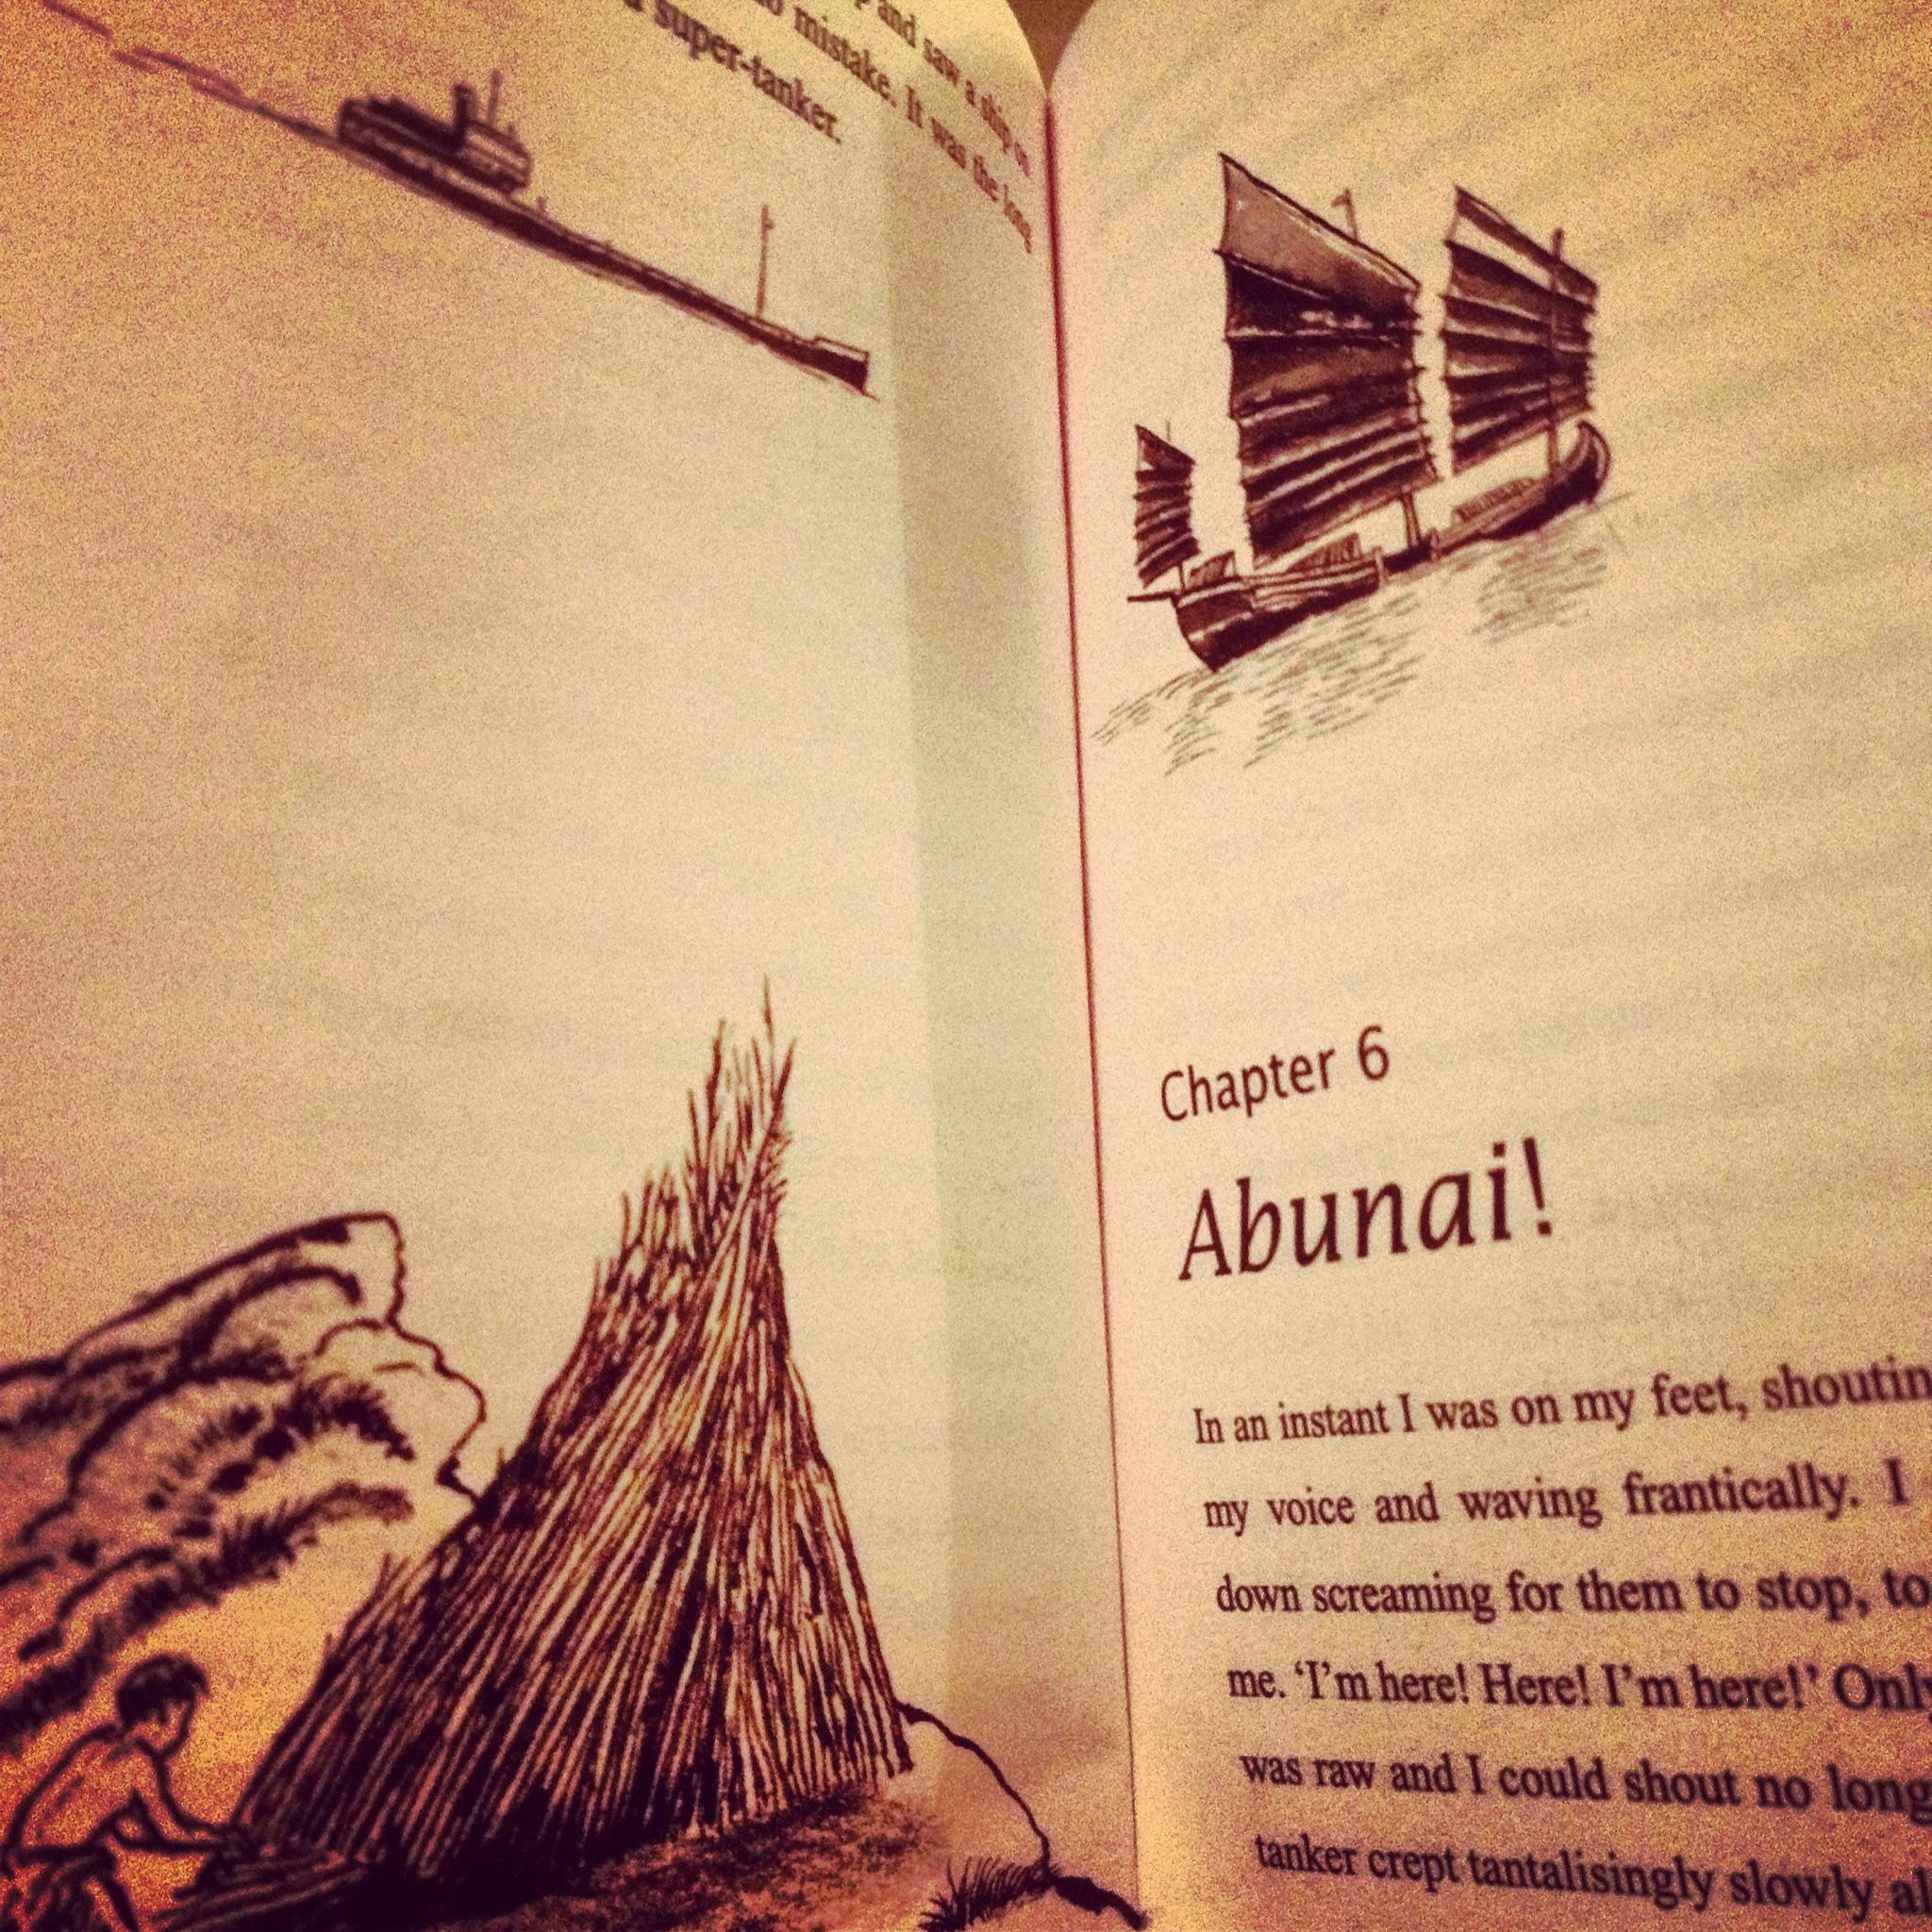 Chapter 6 Abunai